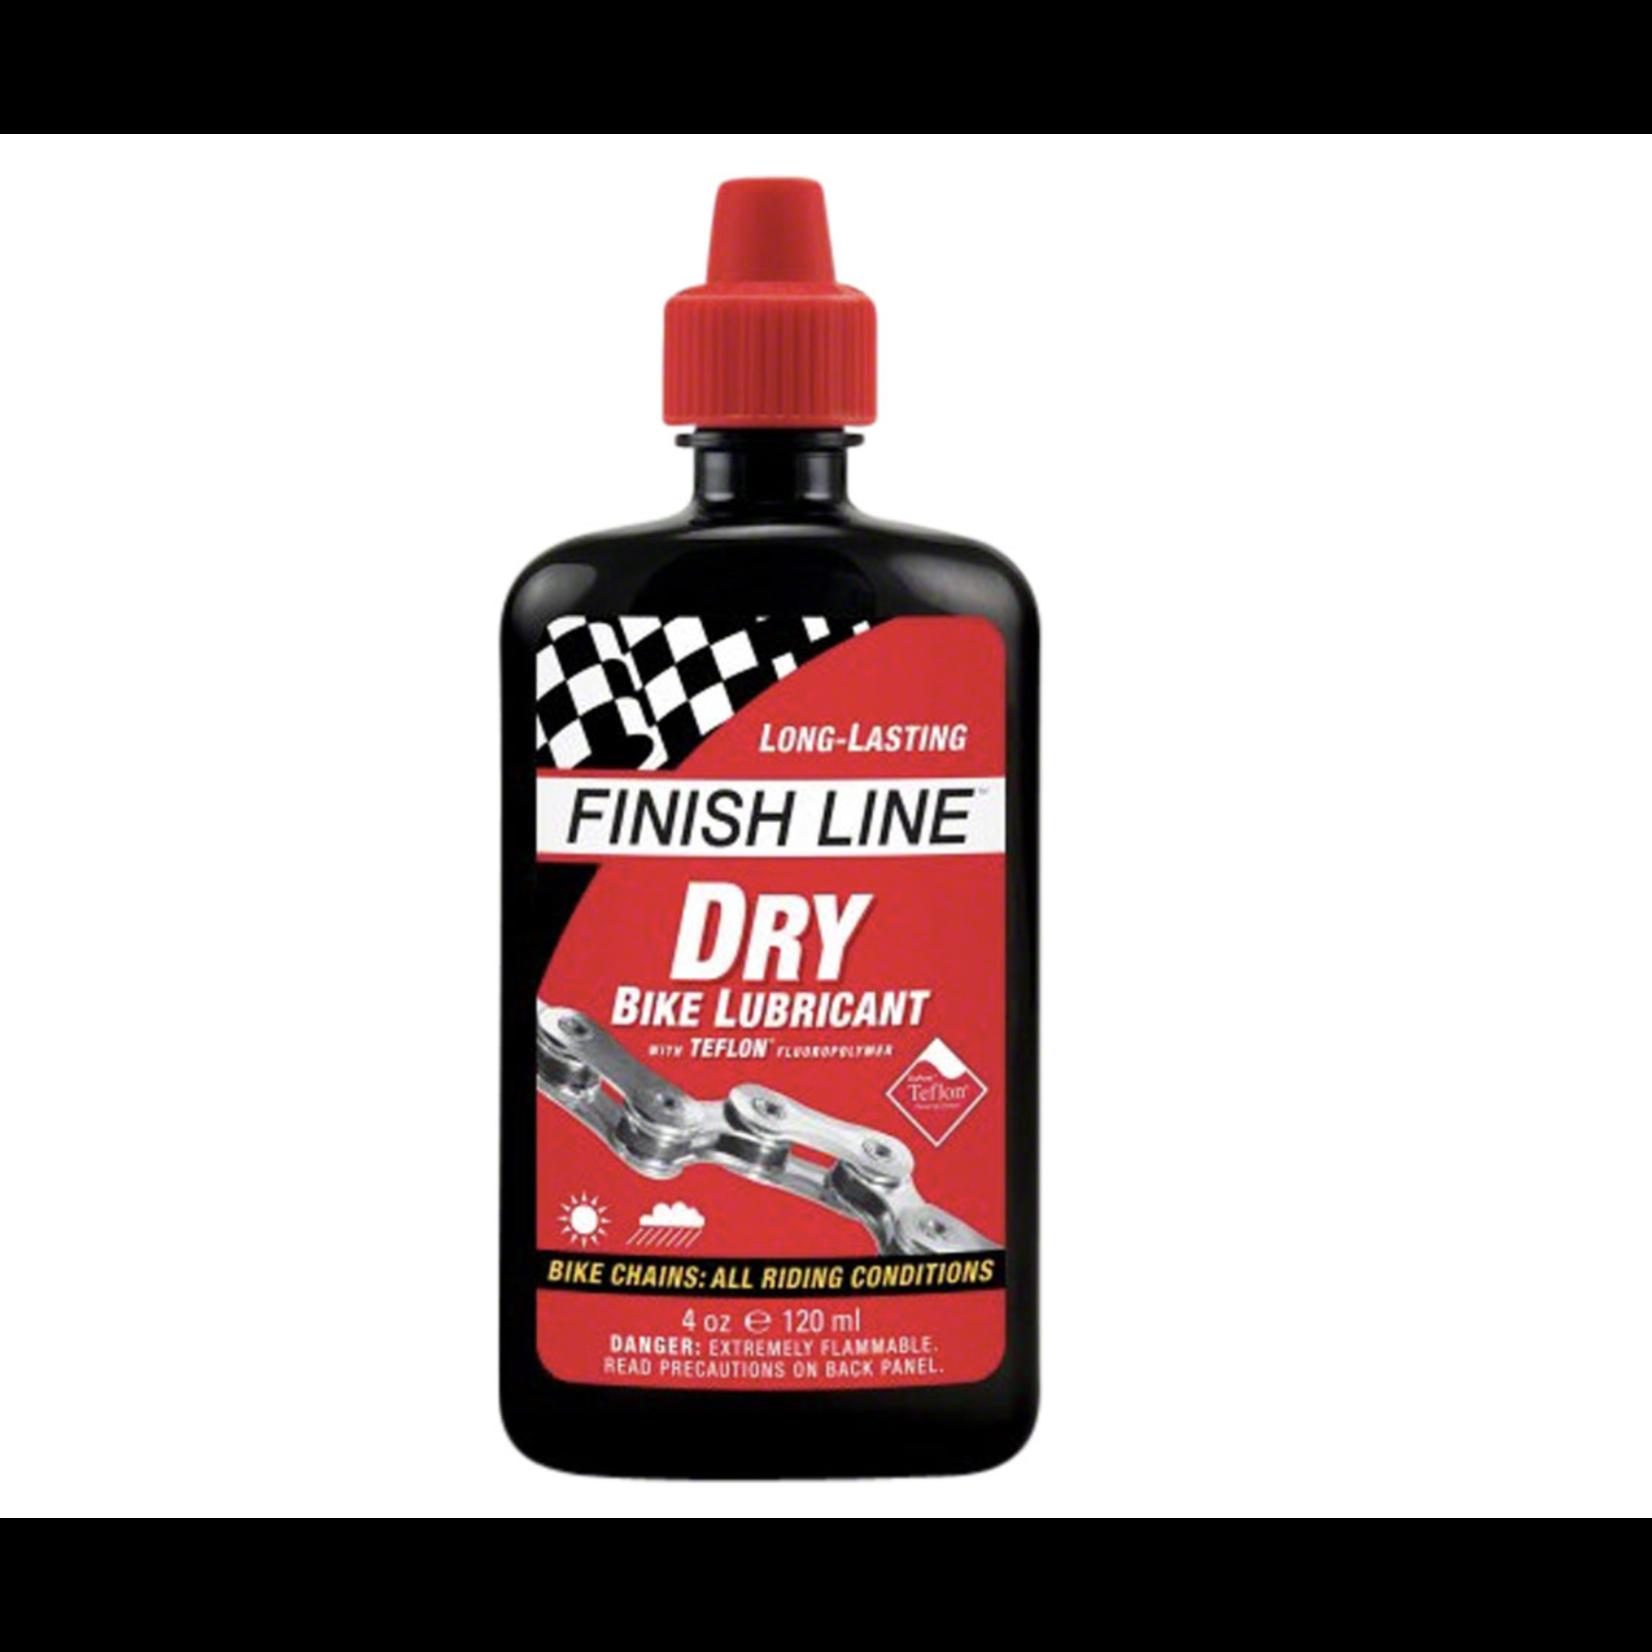 FINISH LINE Finish Line Dry Bike Lubricant